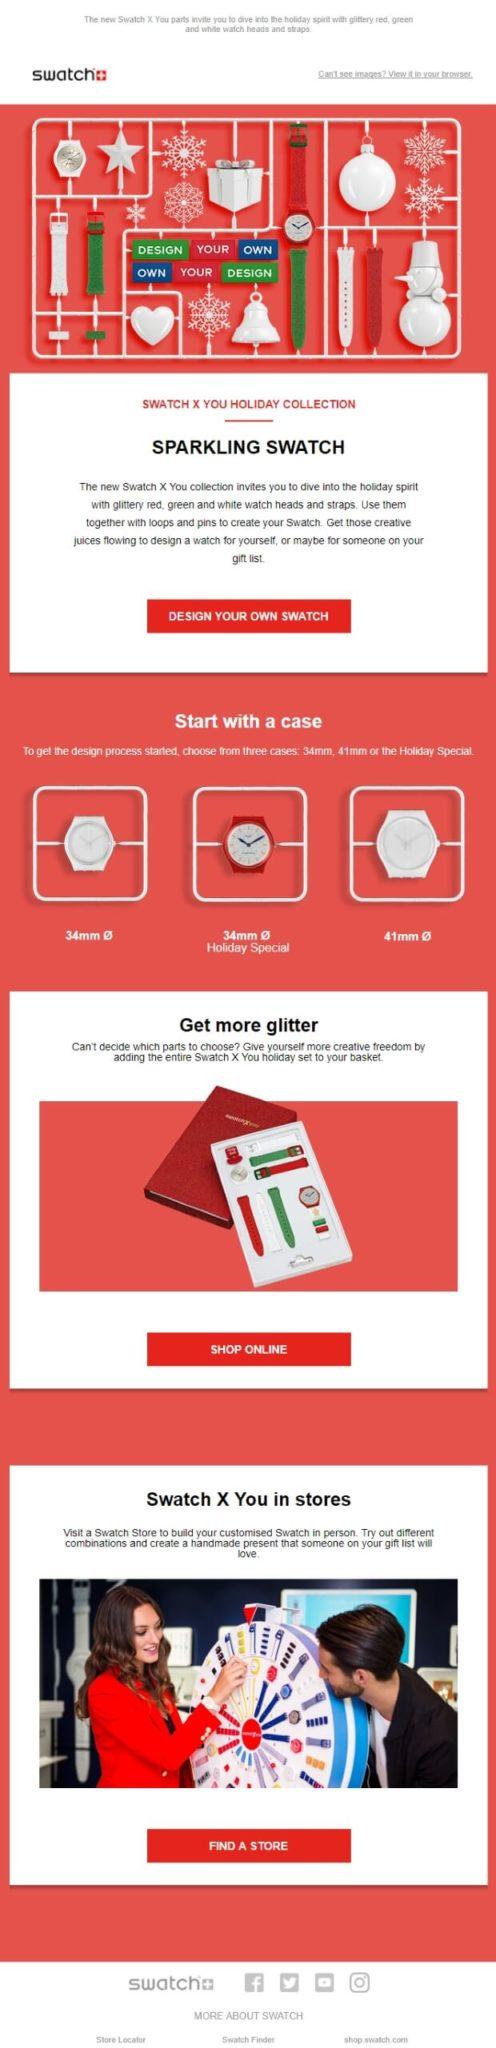 swatch newsletter perfectas para navidad